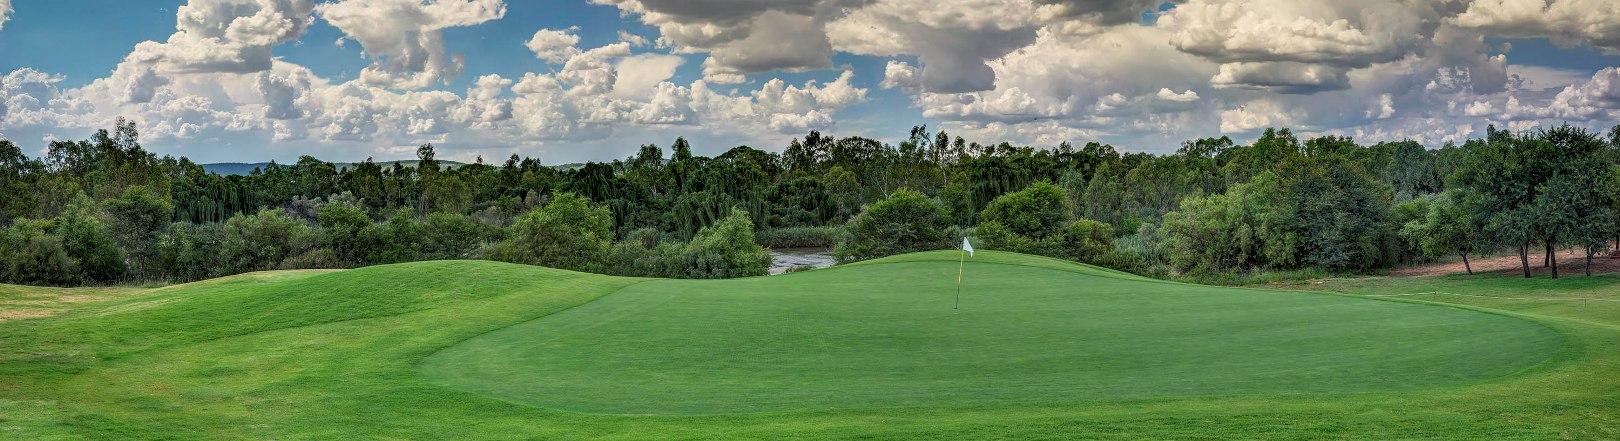 golfc1